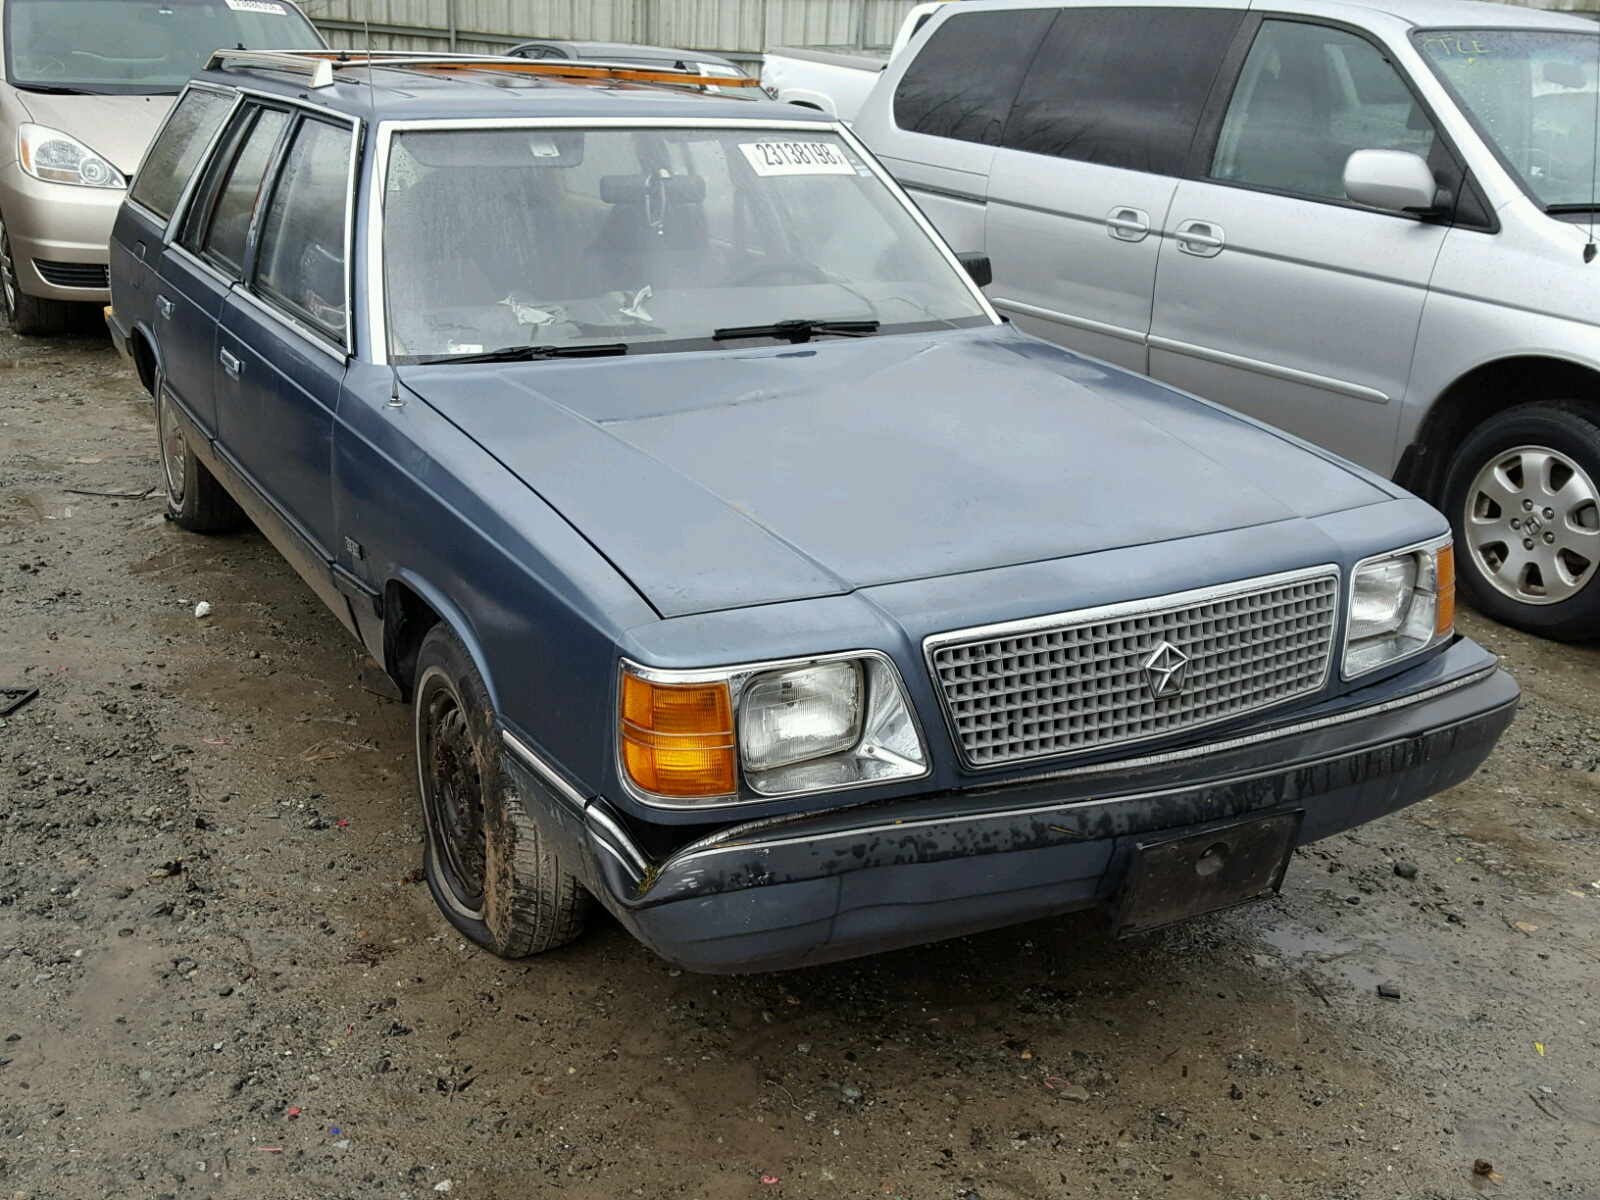 1986 Plymouth Reliant Se